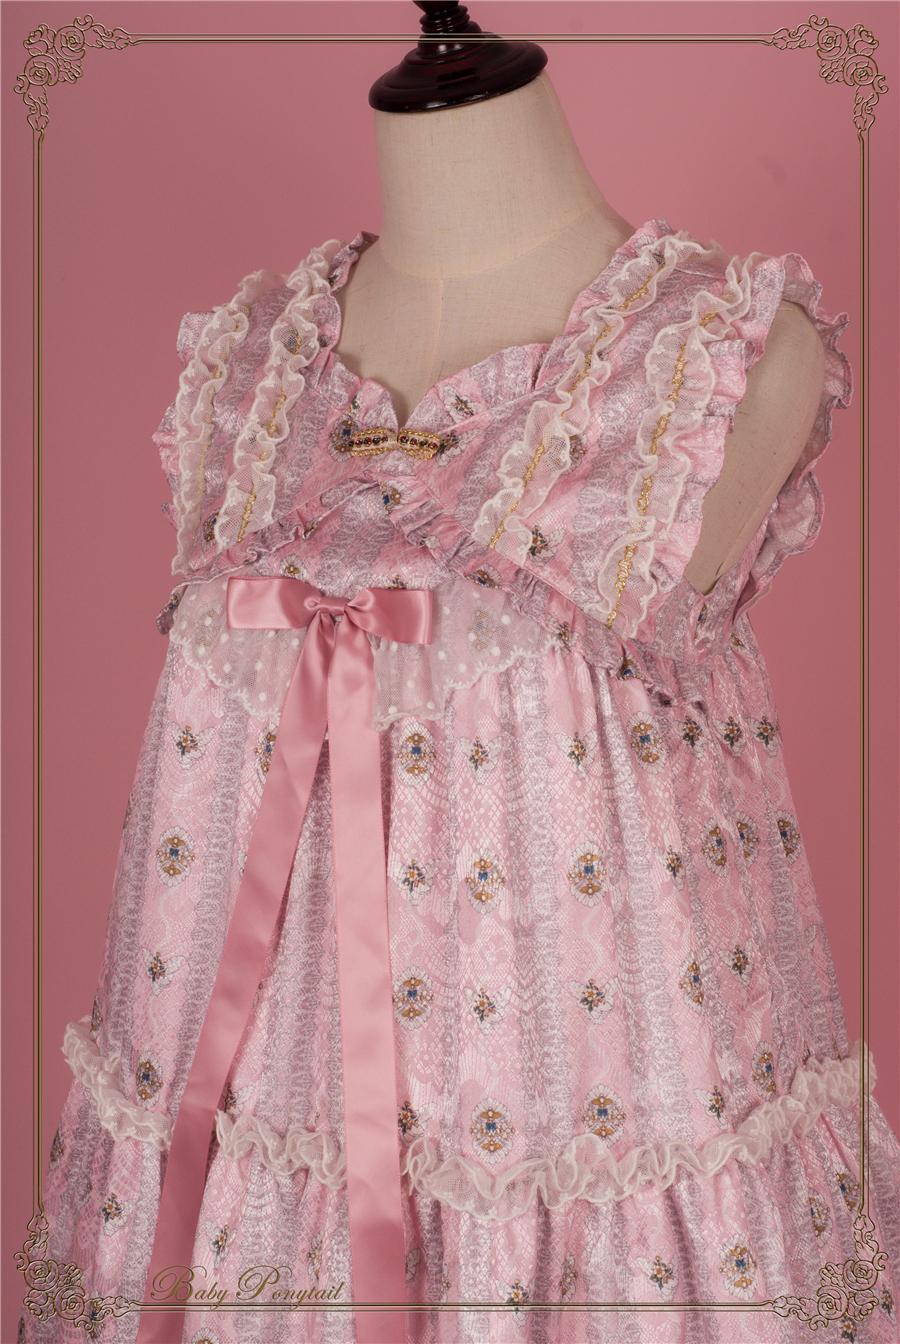 BabyPonytail_Stock Photo_My Favorite Companion_JSK Baby Doll Pink_05.jpg